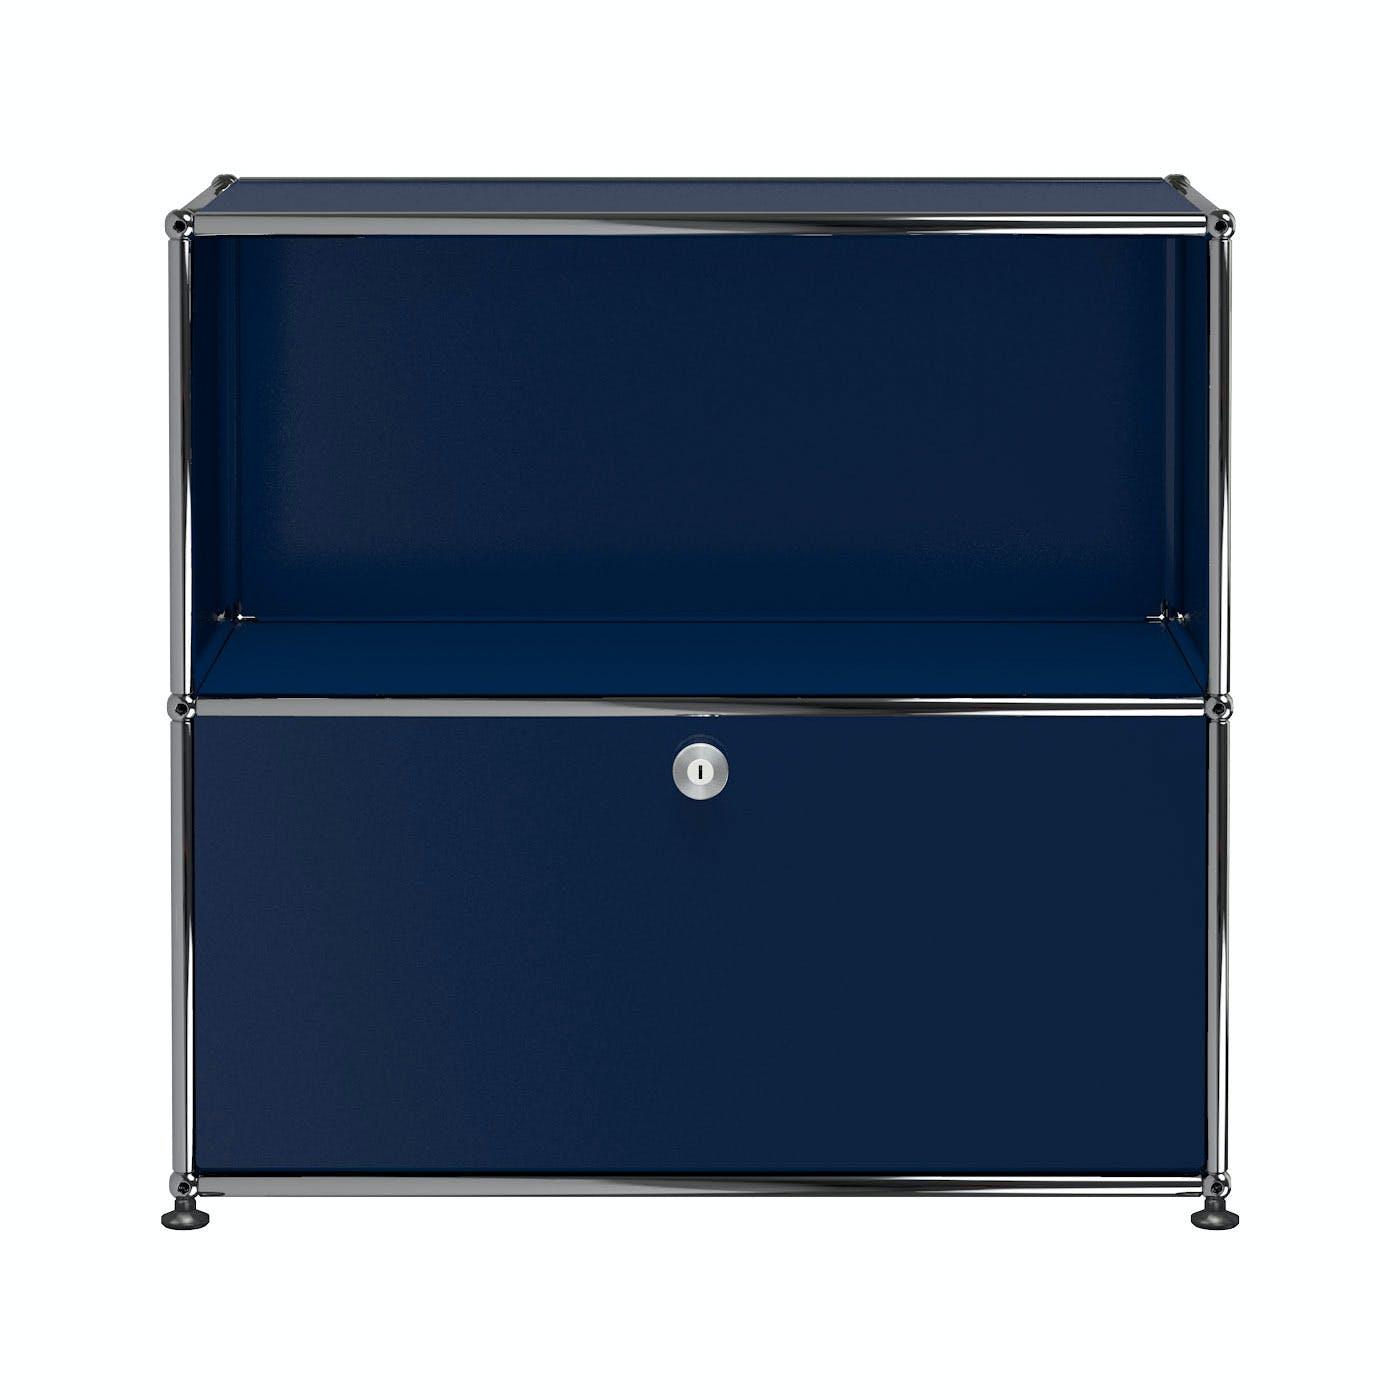 Usm-quick-ship-Haller-Storage-C1B-steel-blue-haute-living